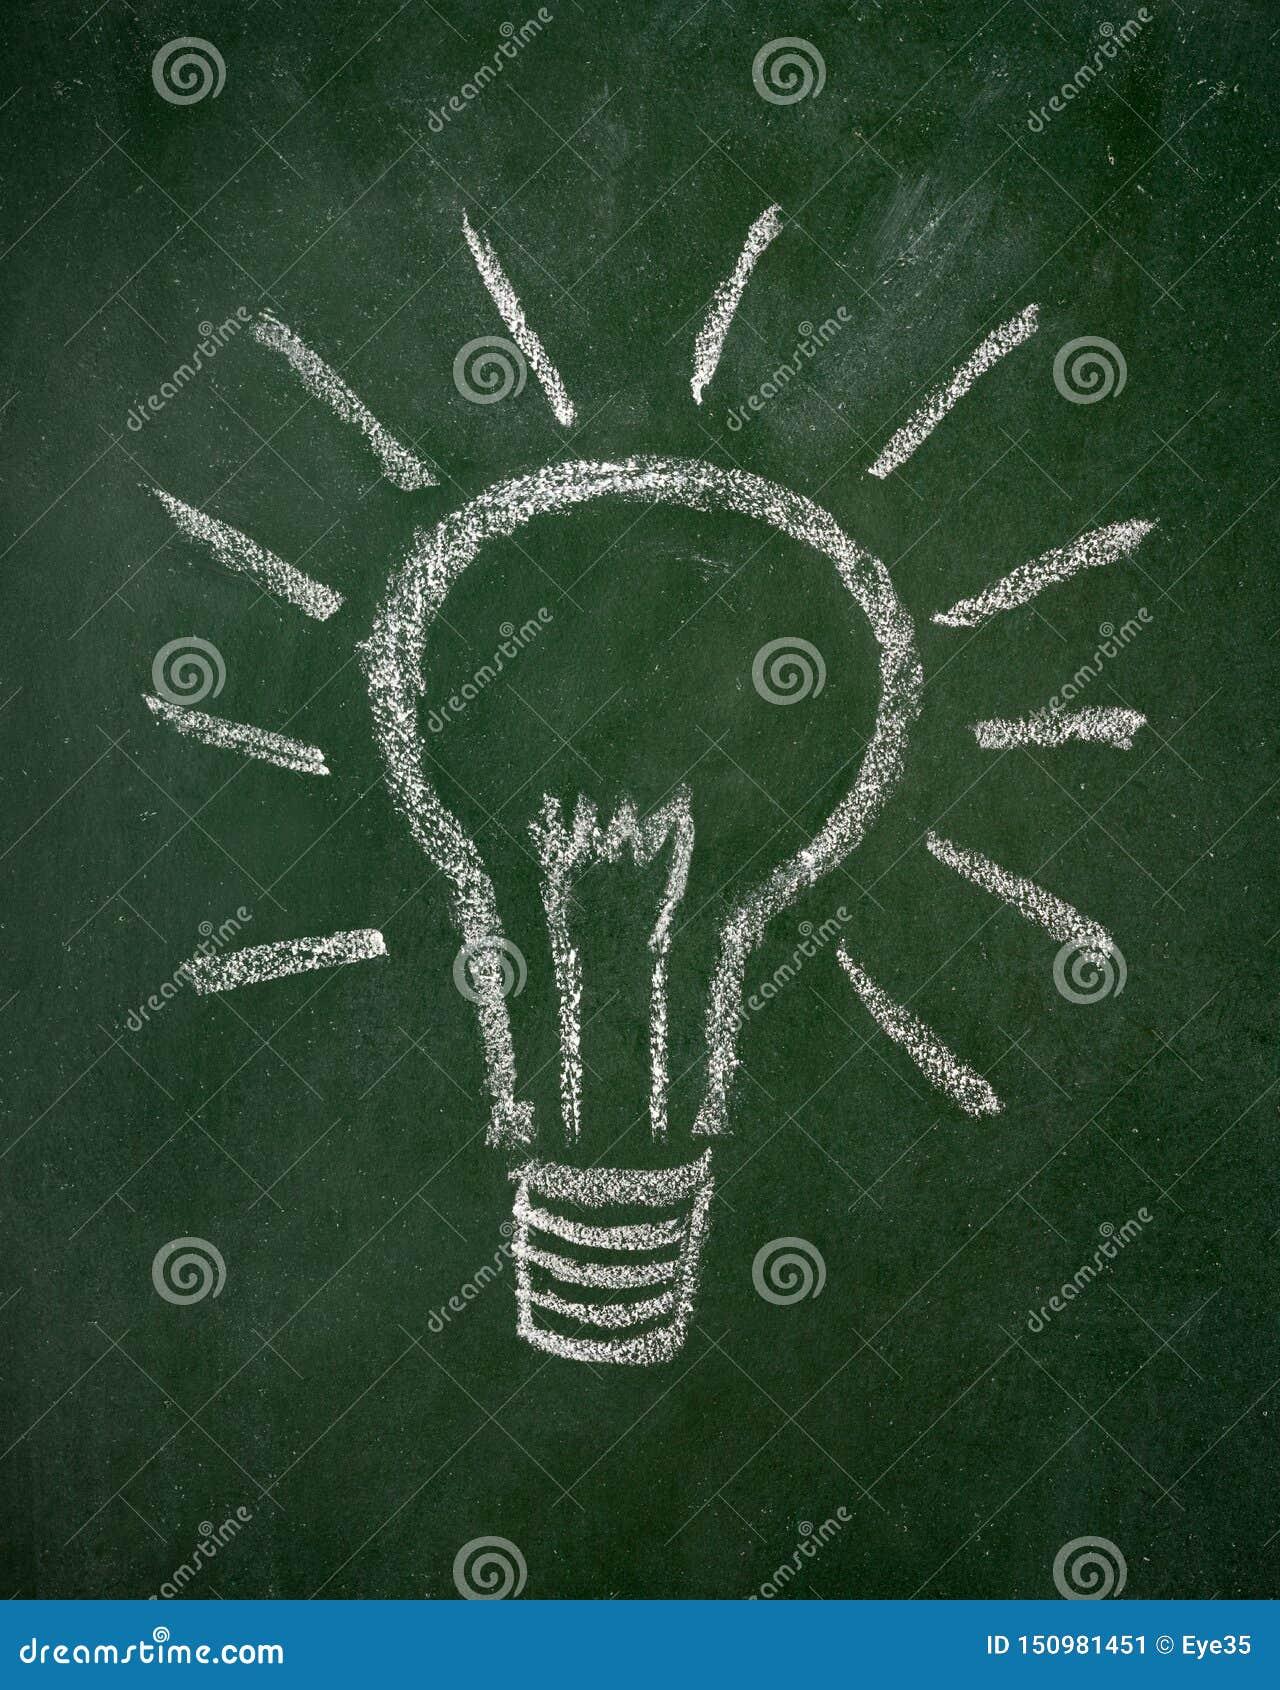 Lightbulb που επισύρεται την προσοχή σε έναν πίνακα κιμωλίας